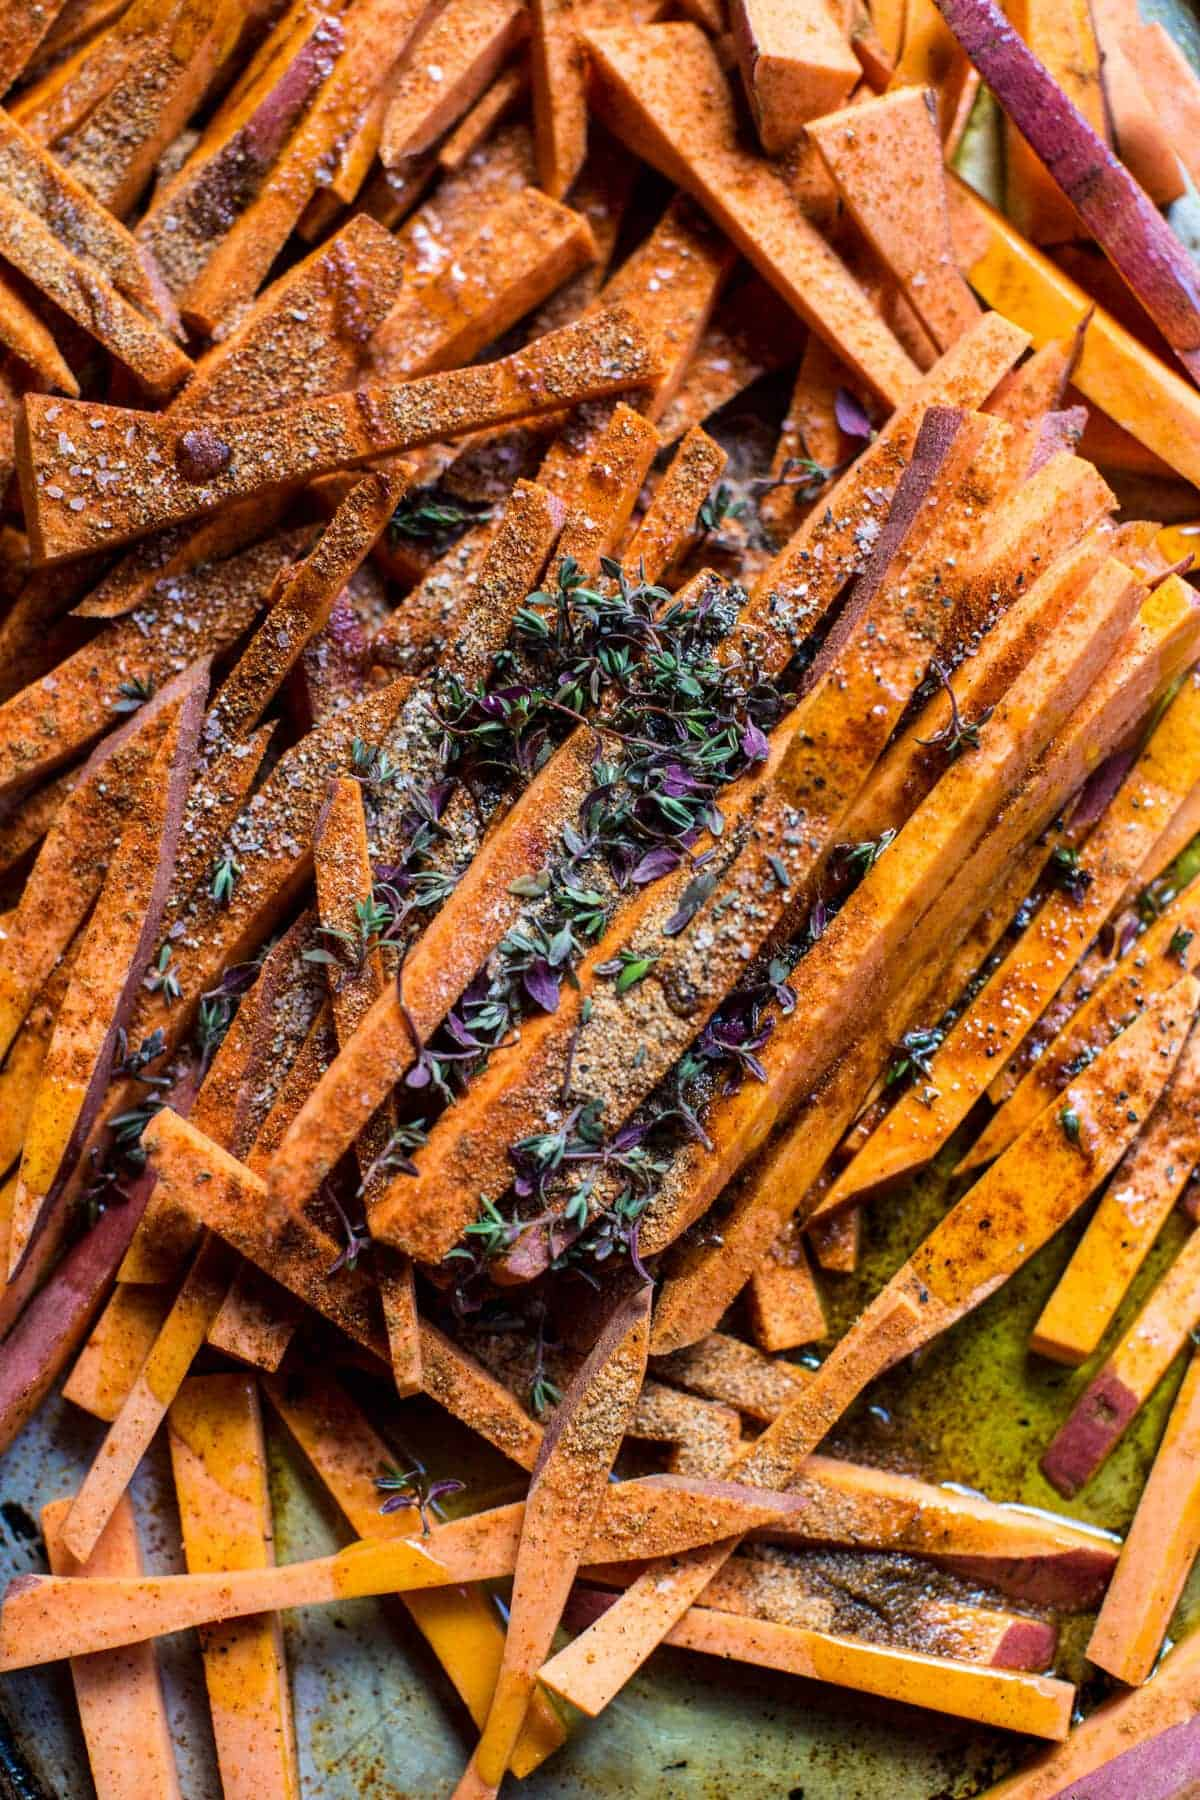 Skinny Cajun Sweet Potato Fries with Garlic Cheese Sauce | halfbakedharvest.com @hbharvest